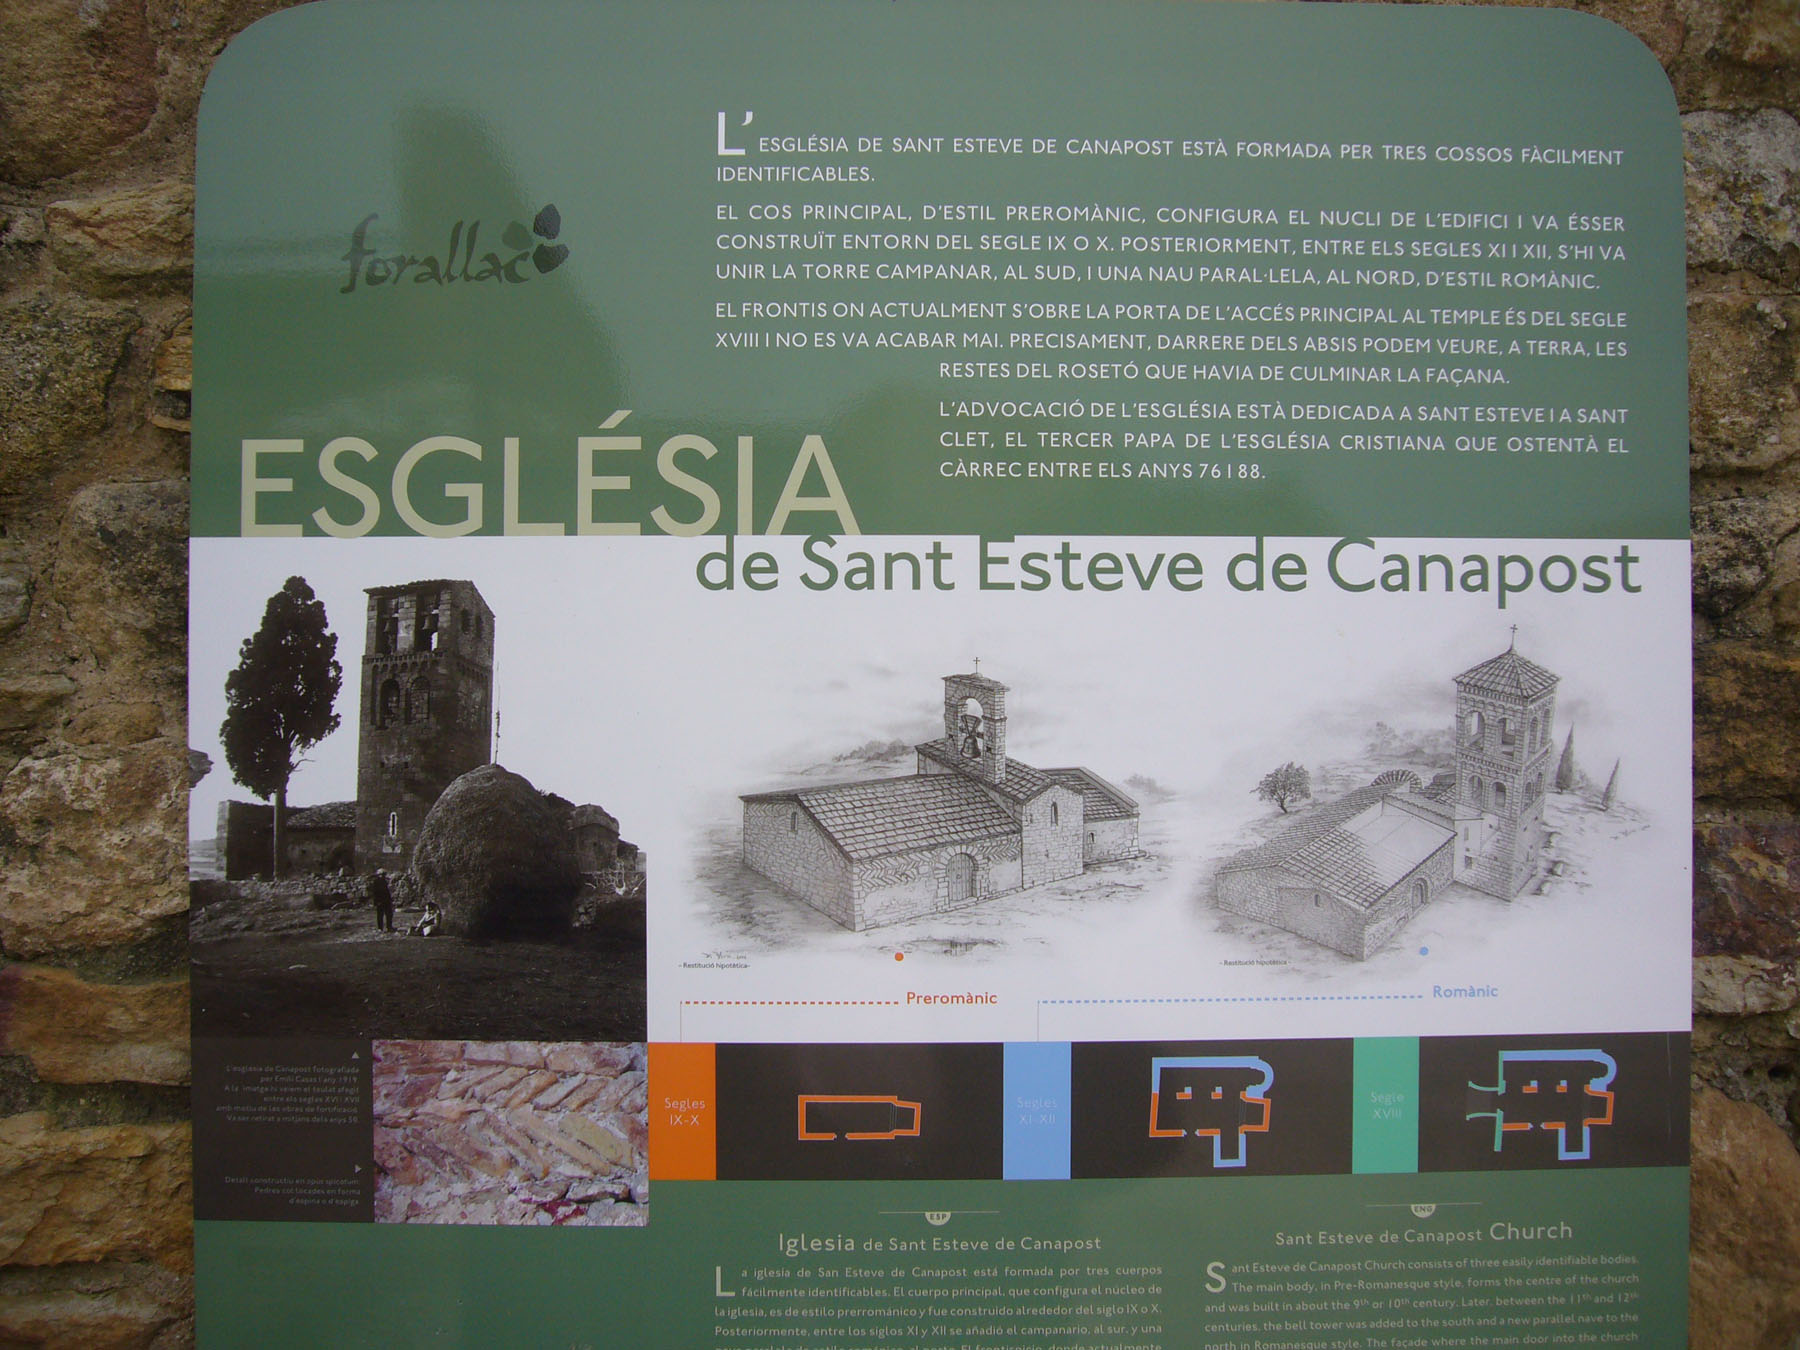 esglesia-de-sant-esteve-de-canapost-100422_501